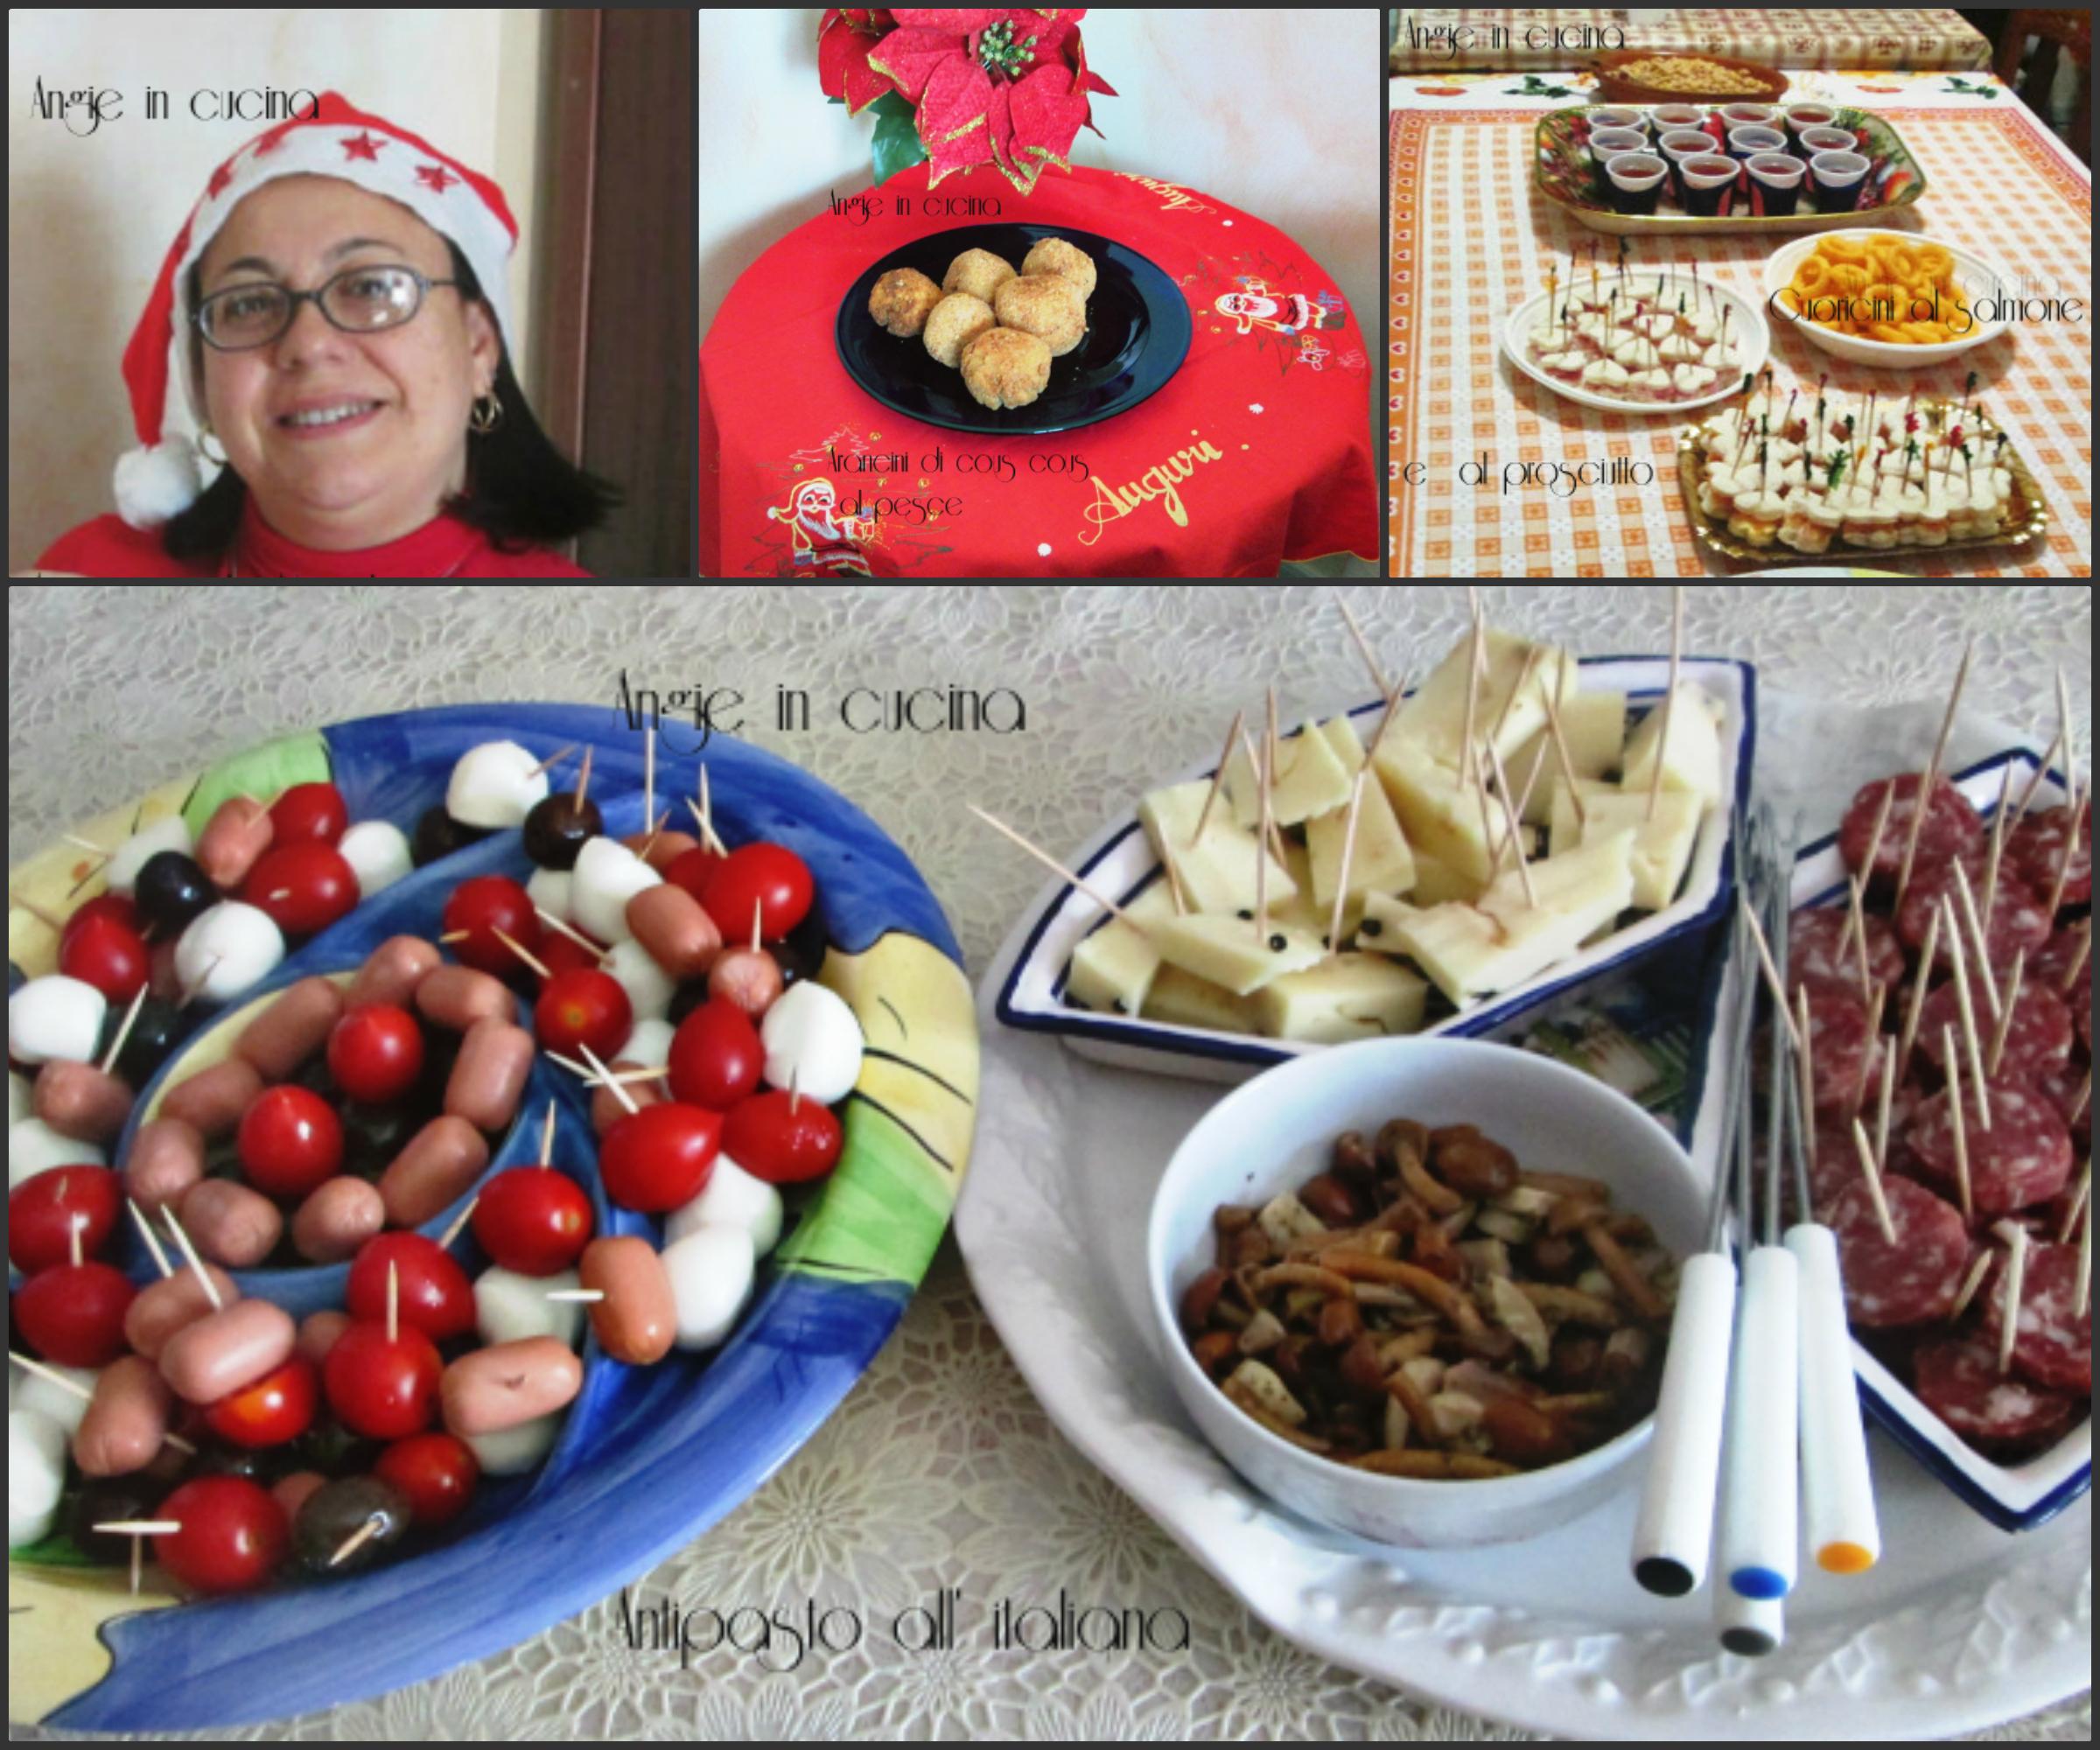 Antipasti Di Natale Misti.Antipasti Misti Per Natale Angie In Cucina